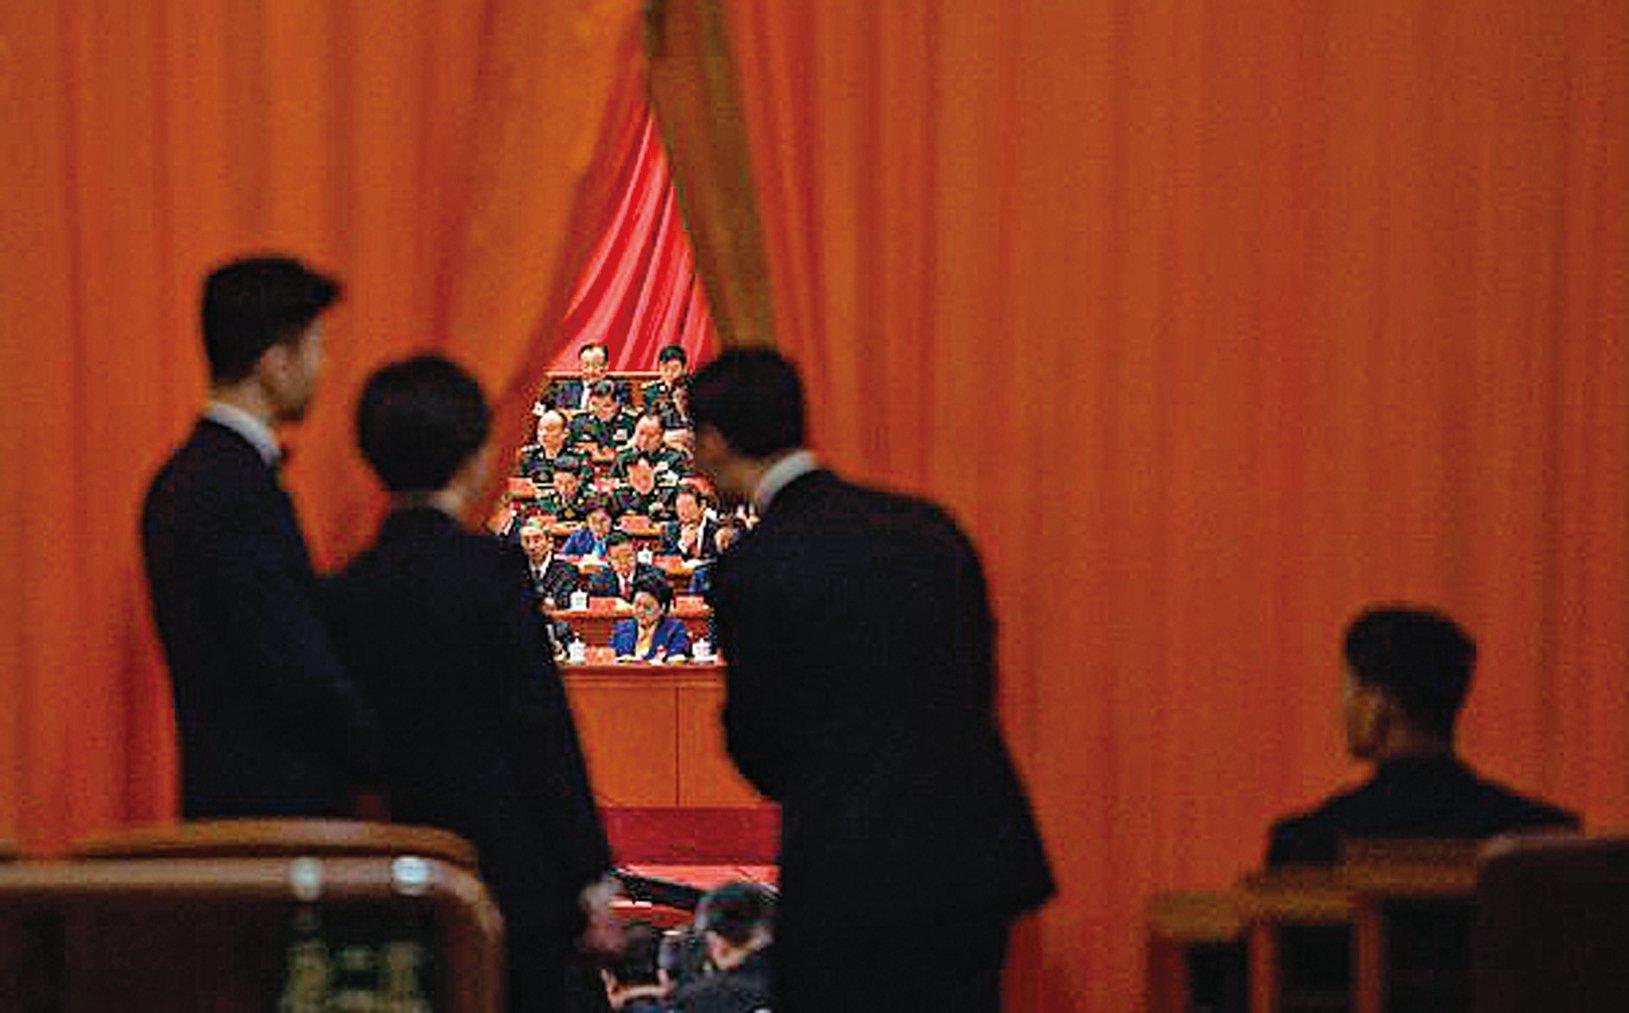 3月11日下午,中共全國人大代表表決修憲草案現場。(FRED DUFOUR/AFP/Getty Images)